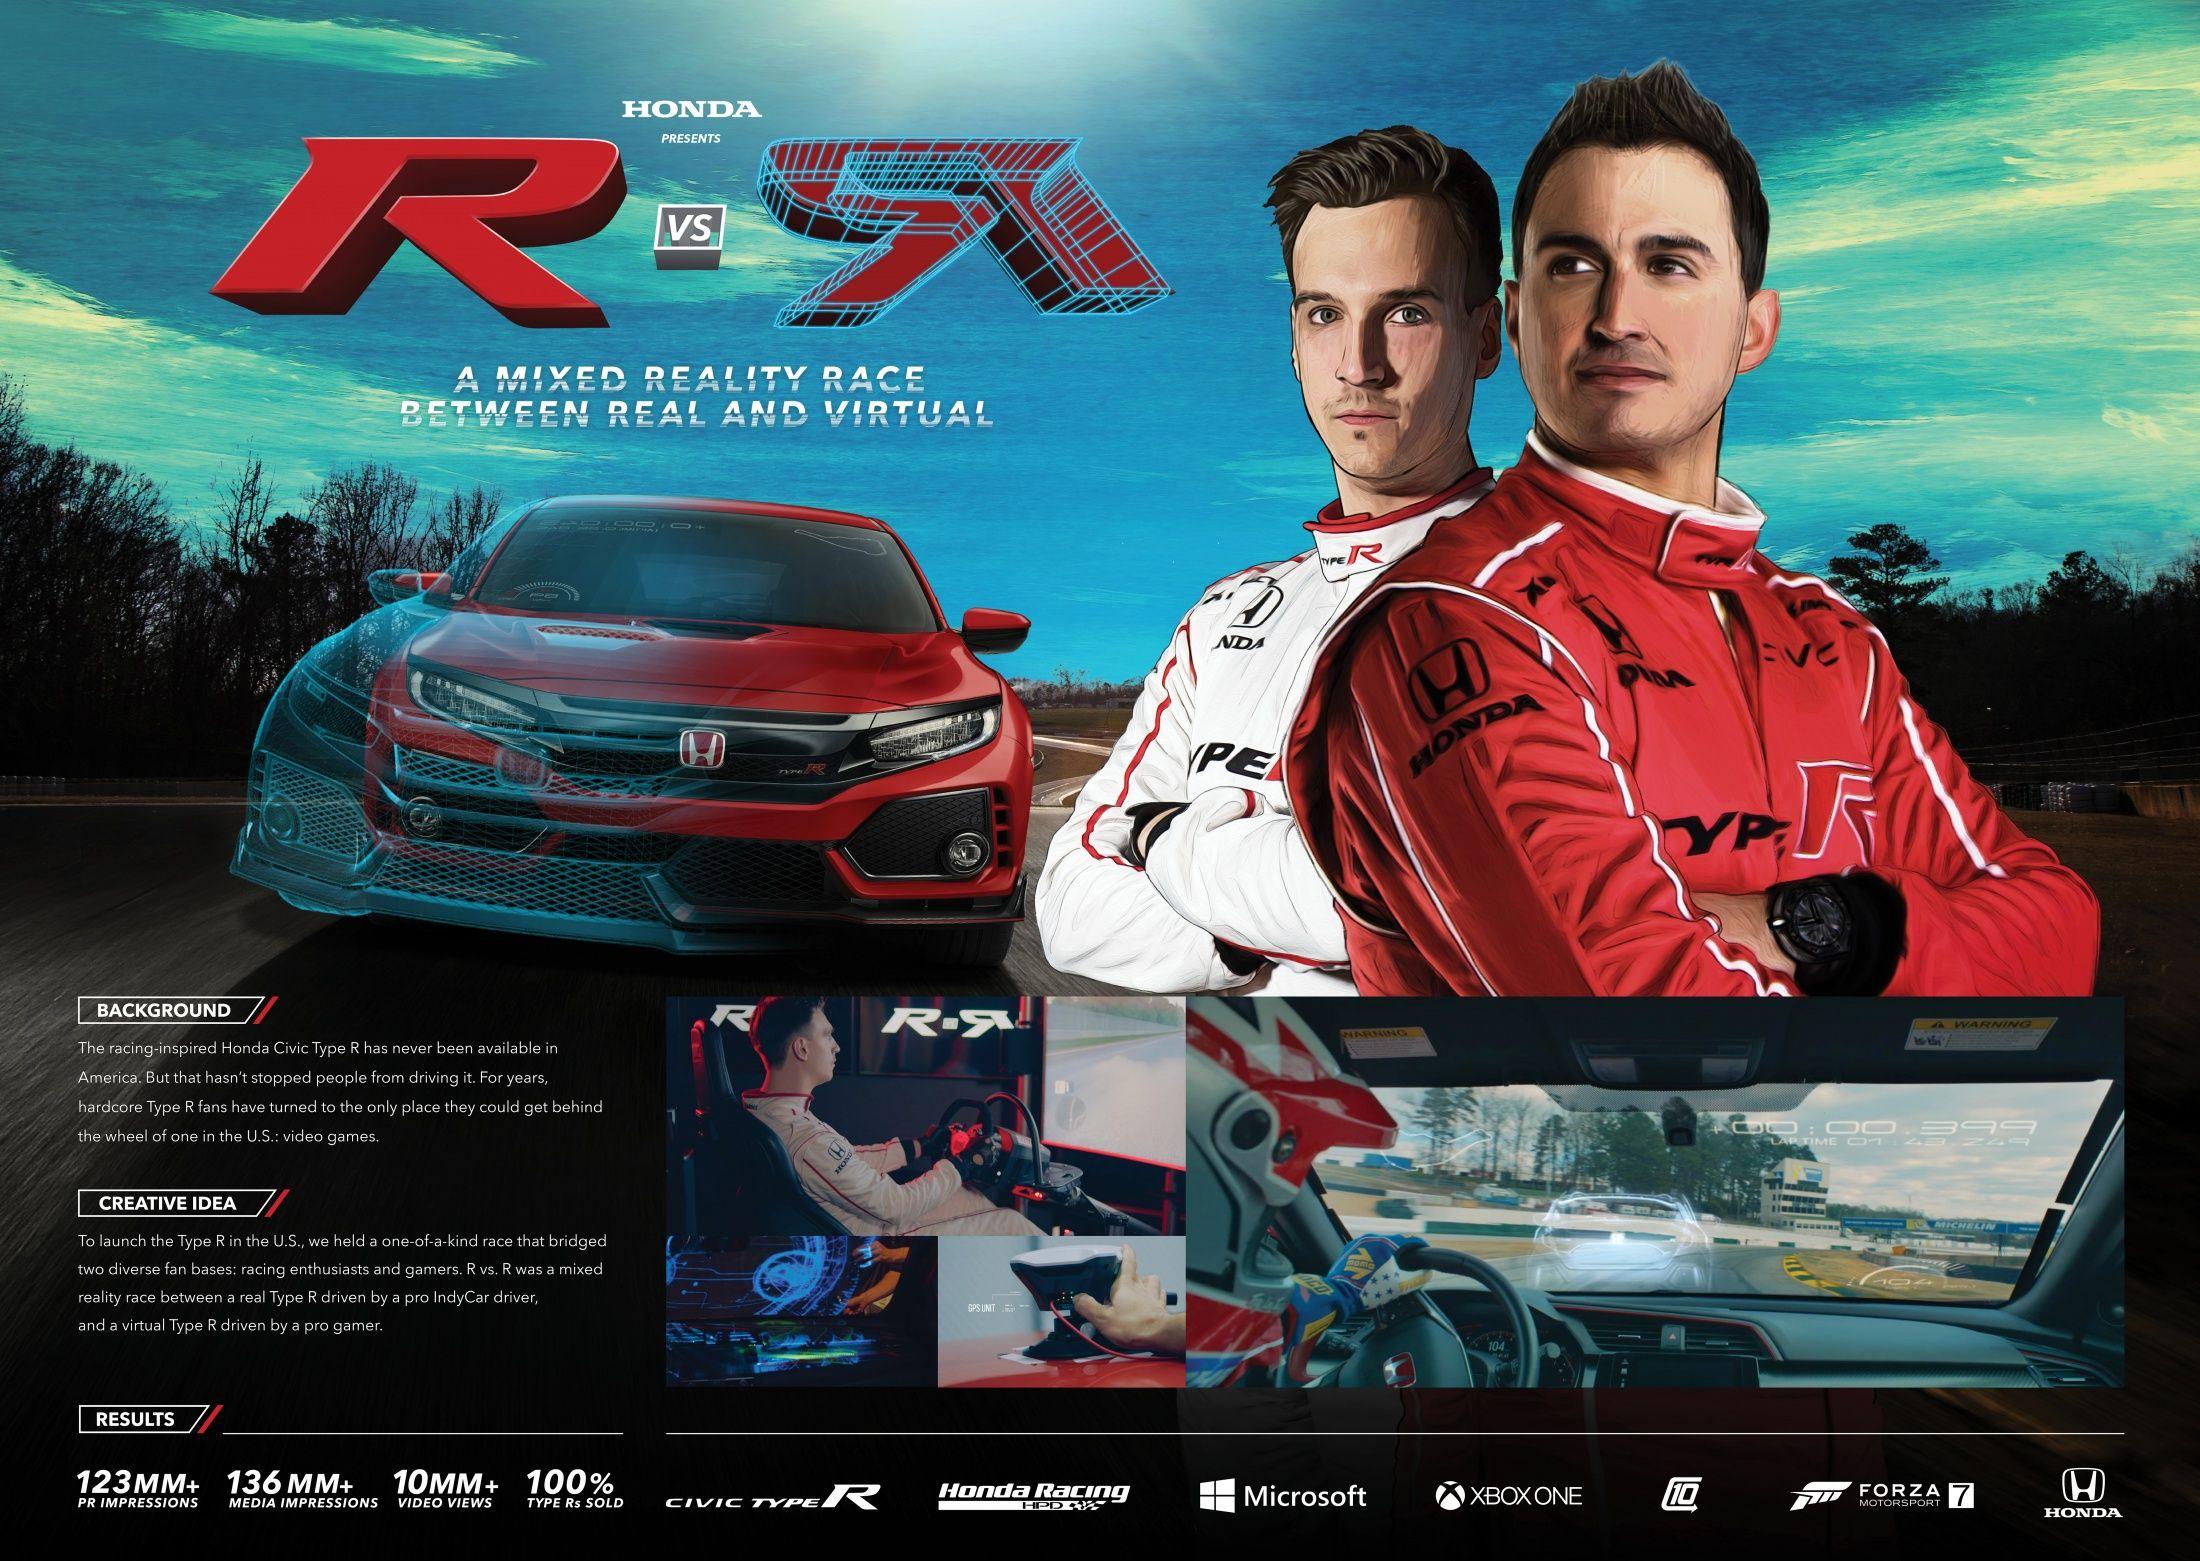 American Honda Motor Co., Inc. R vs. R Clios